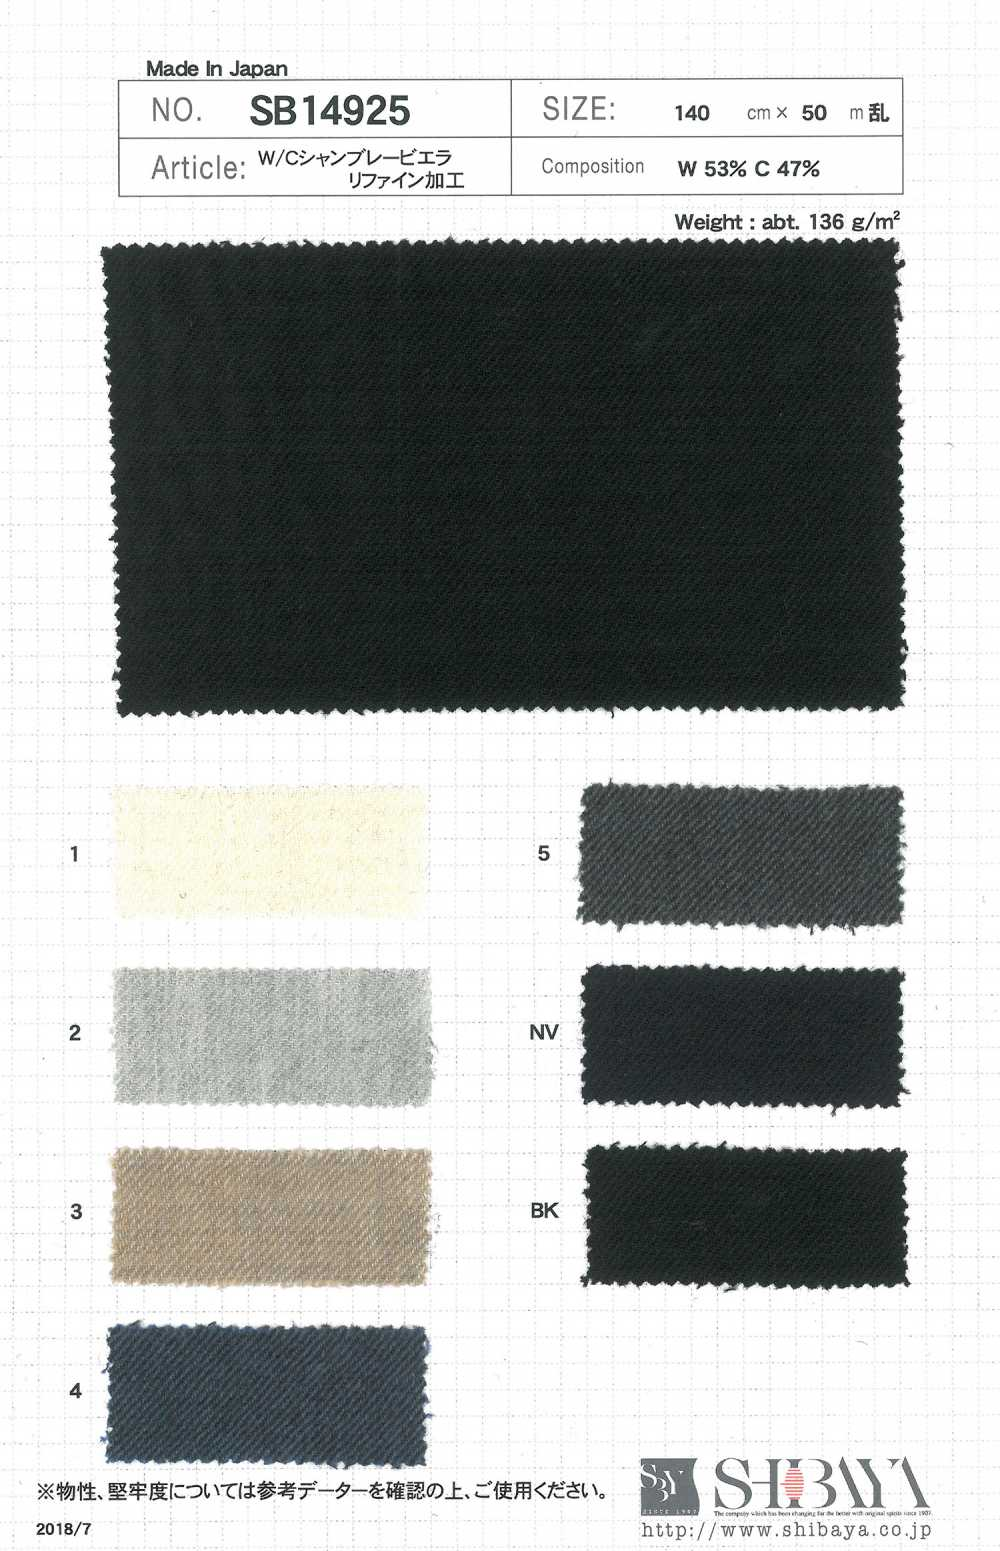 SB14925 W/C シャンブレービエラリファイン加工[生地] 柴屋/オークラ商事 - ApparelX アパレル資材卸通販